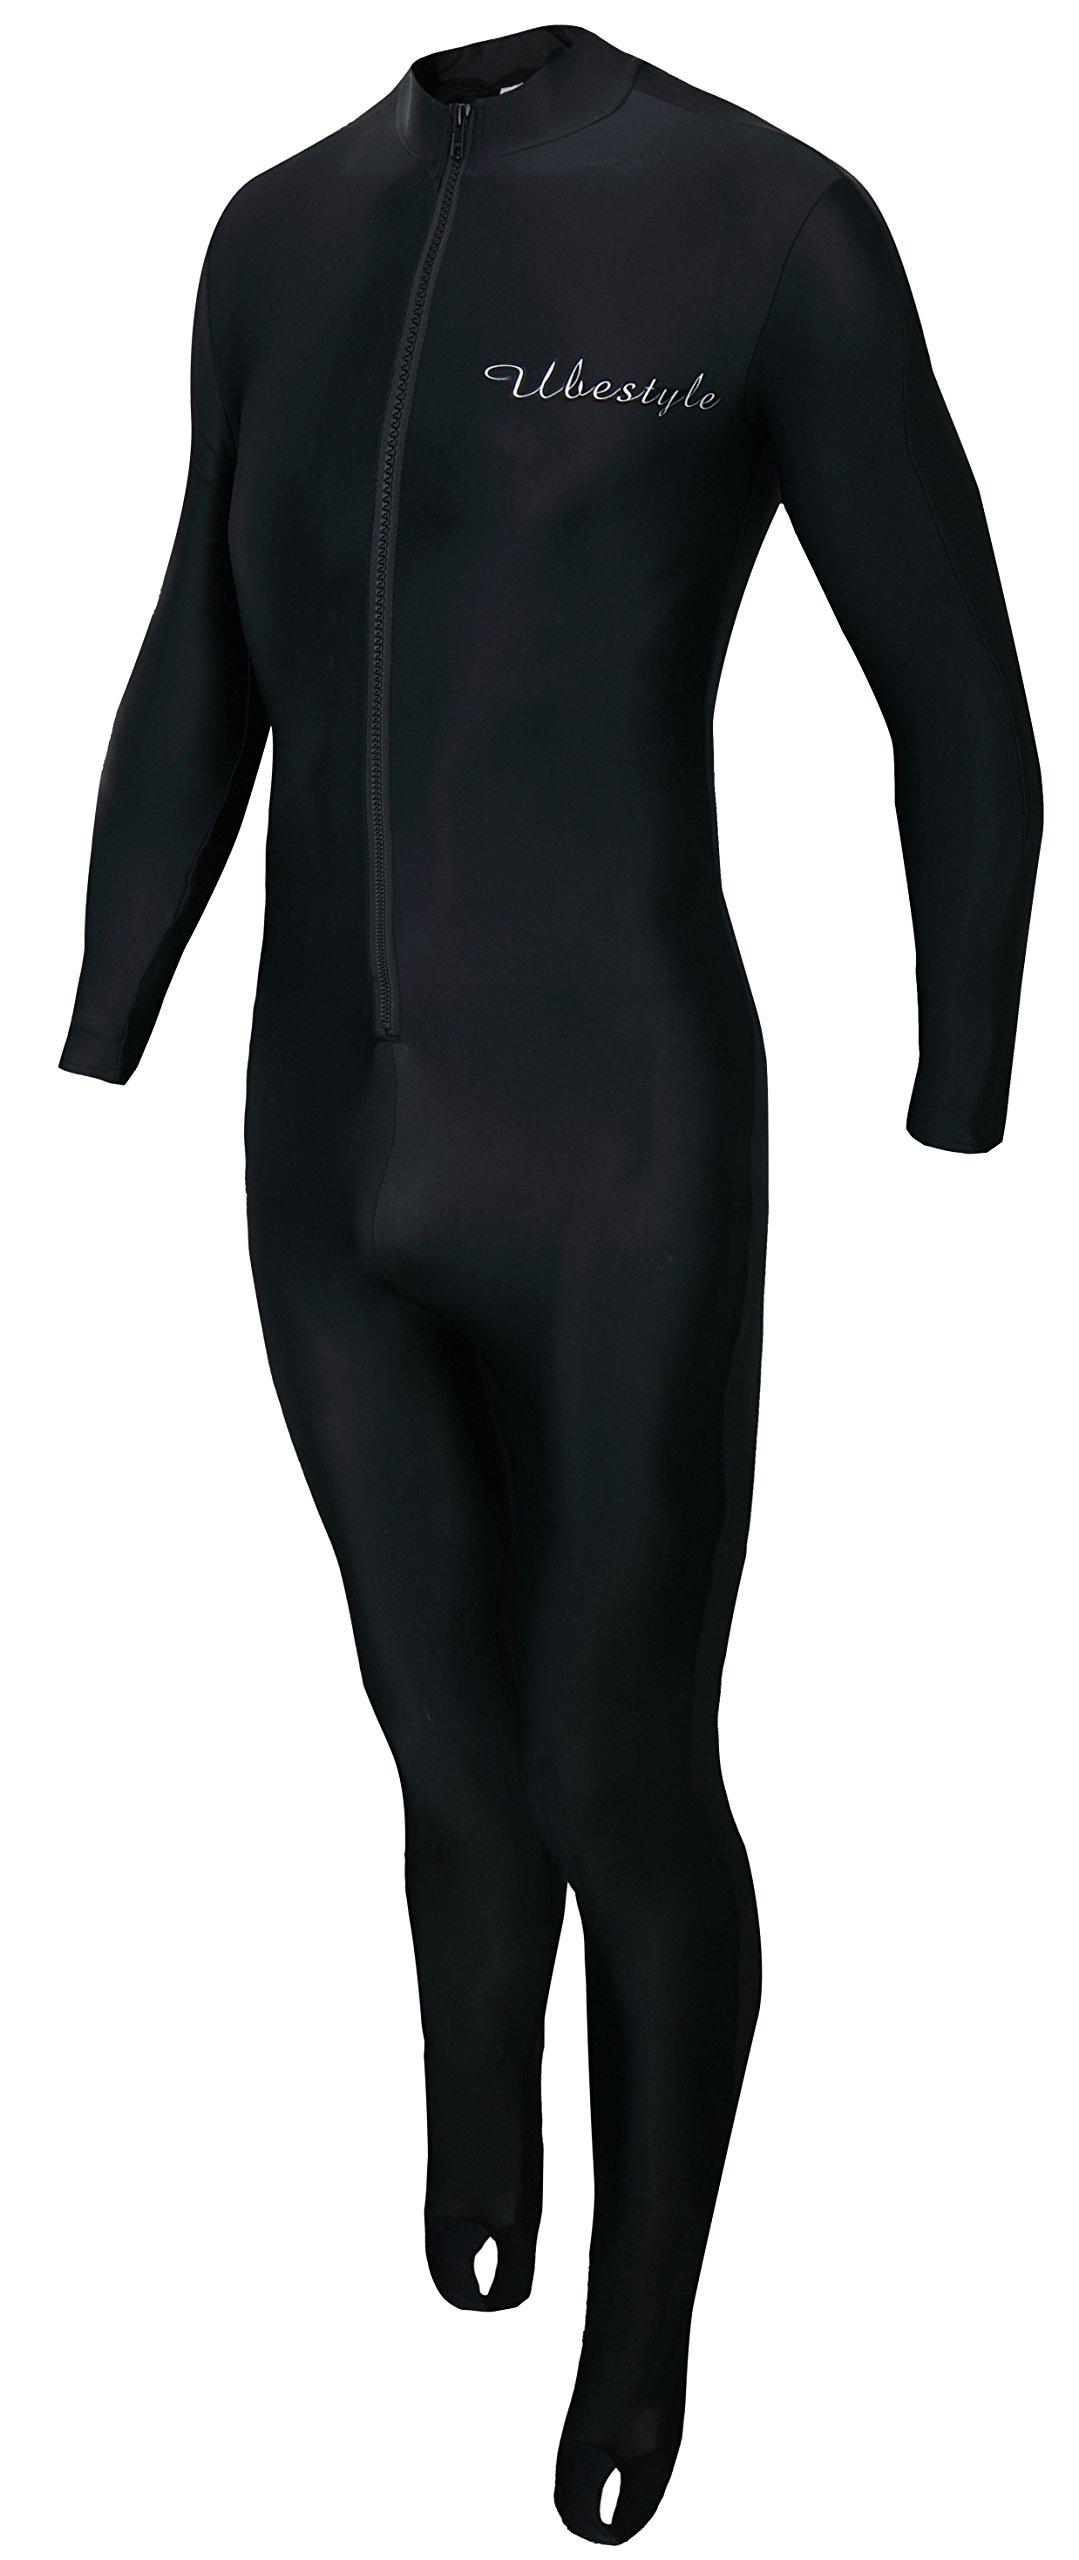 Ubestyle Lycra Full Body Sports Skins - Diving Snorkeling Swimming & Running Exercising (Black, XL)